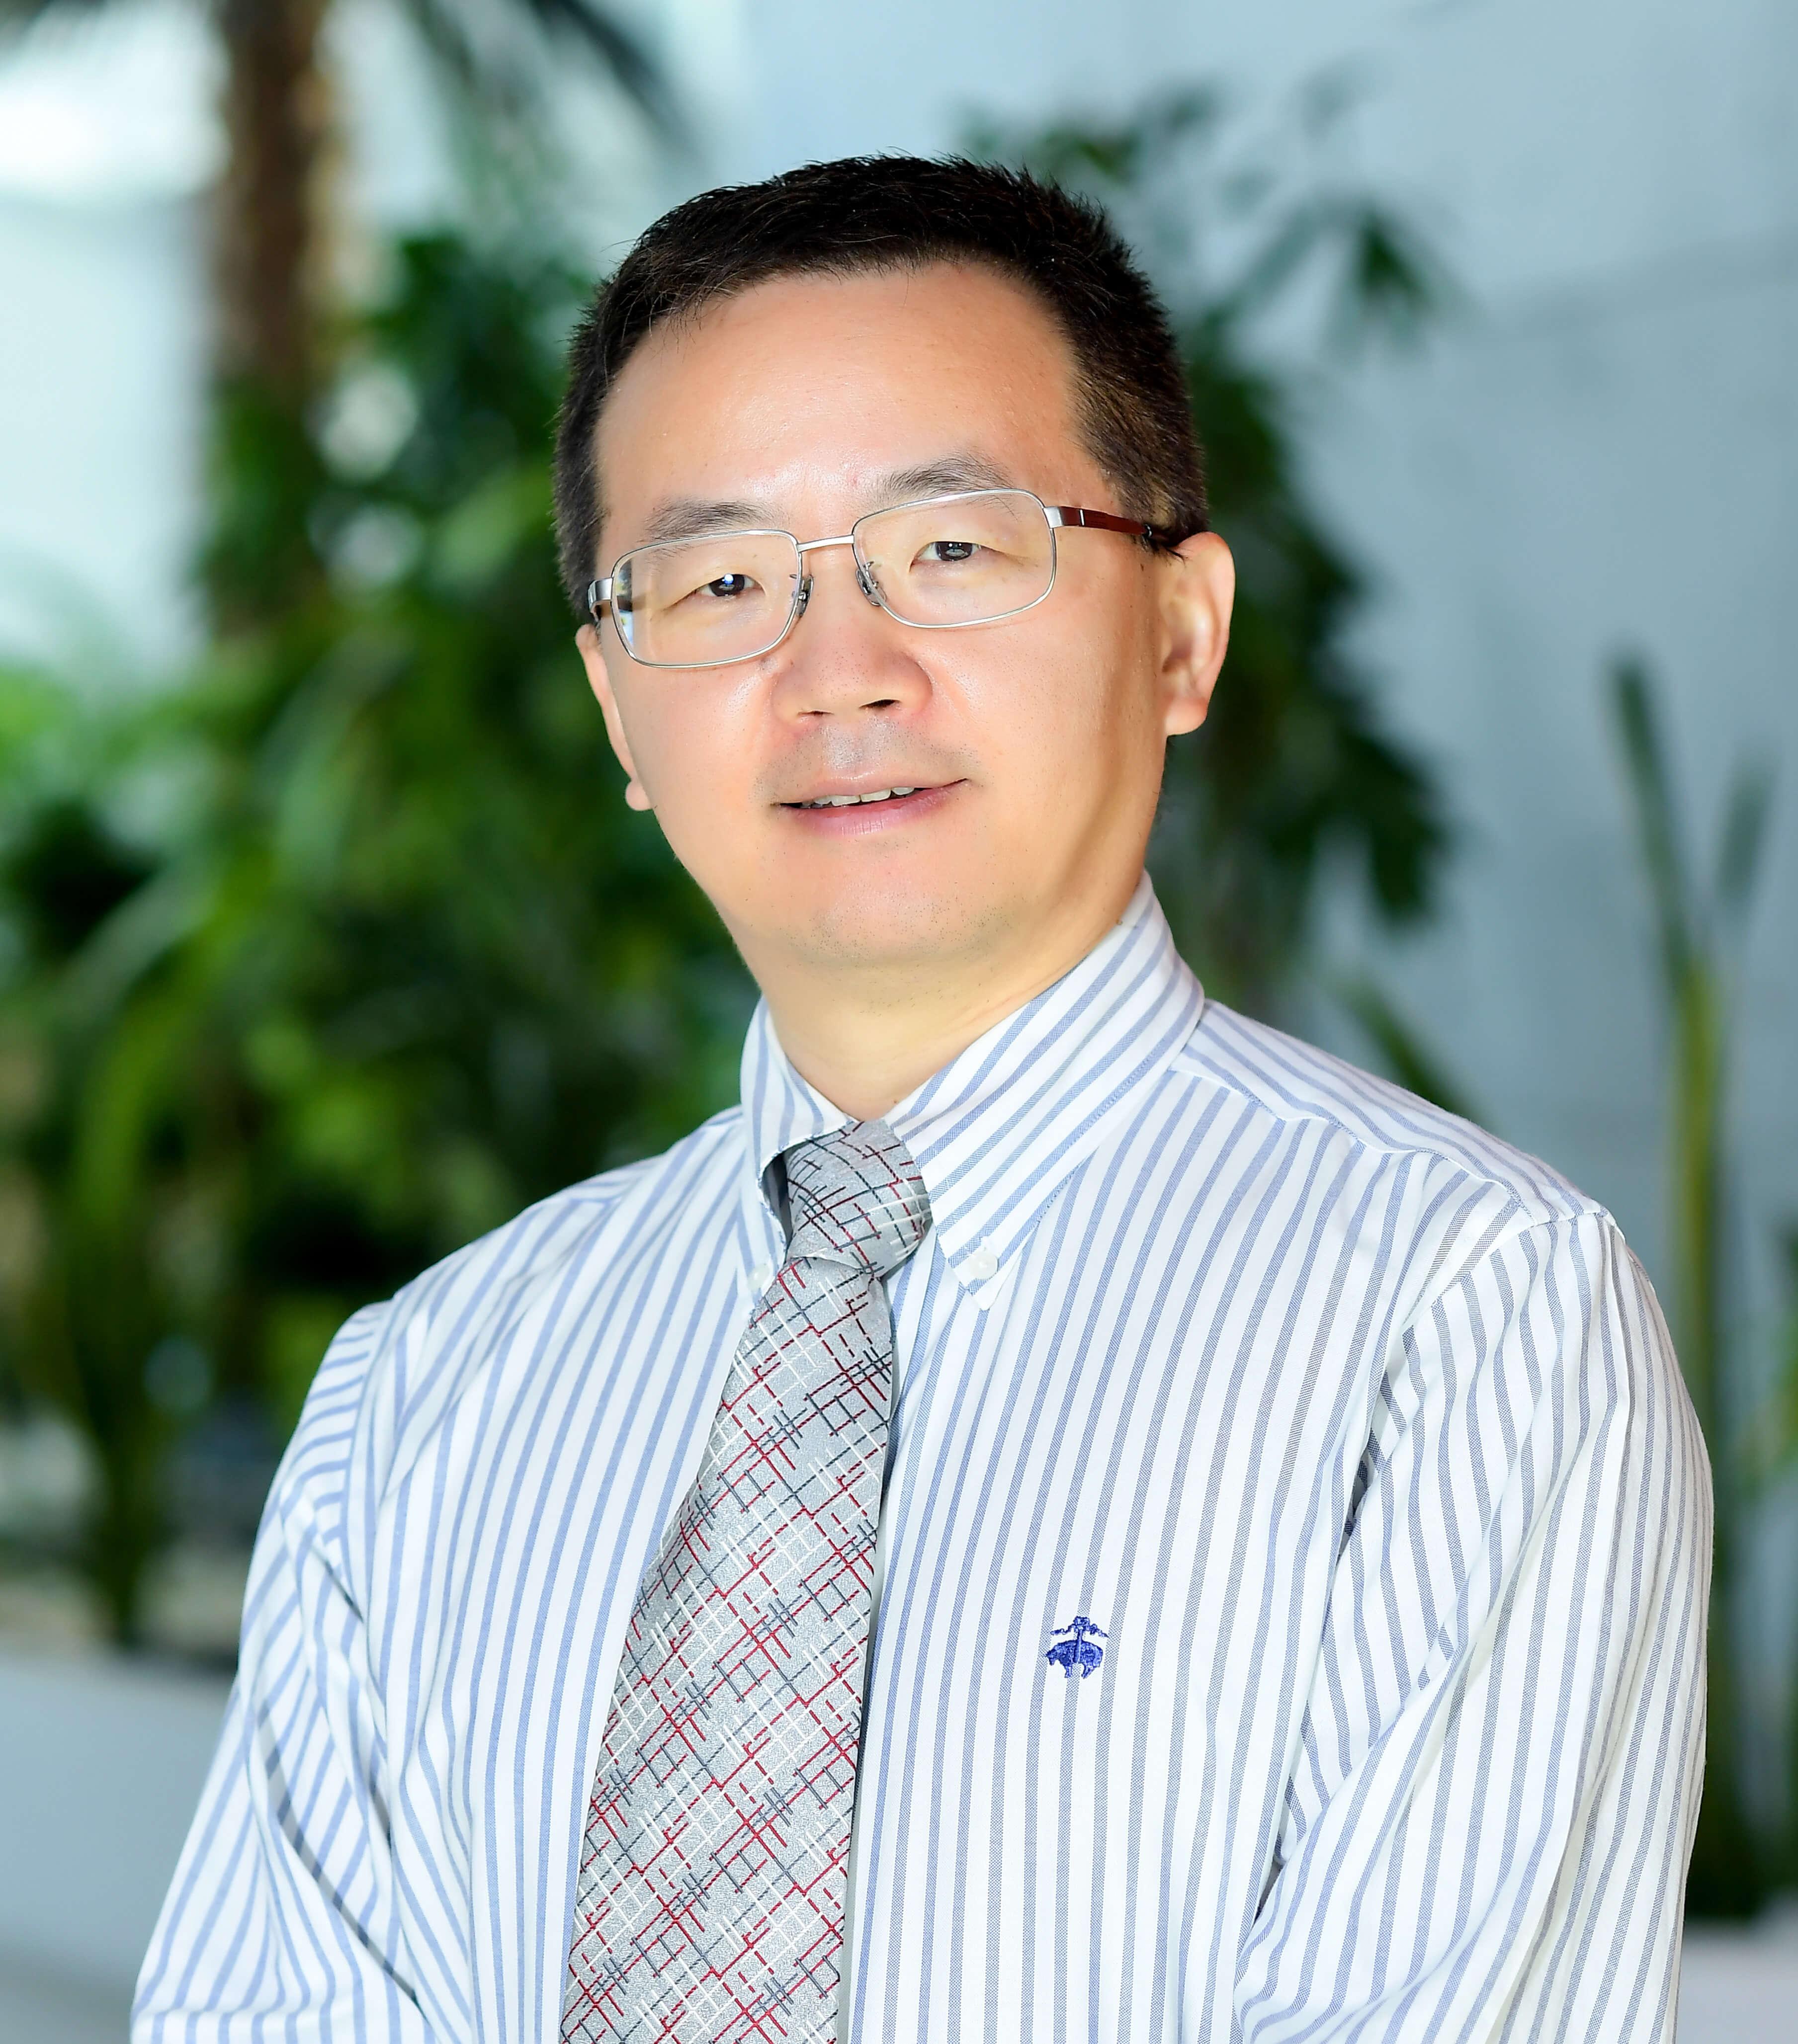 Dr. Samuel Mao